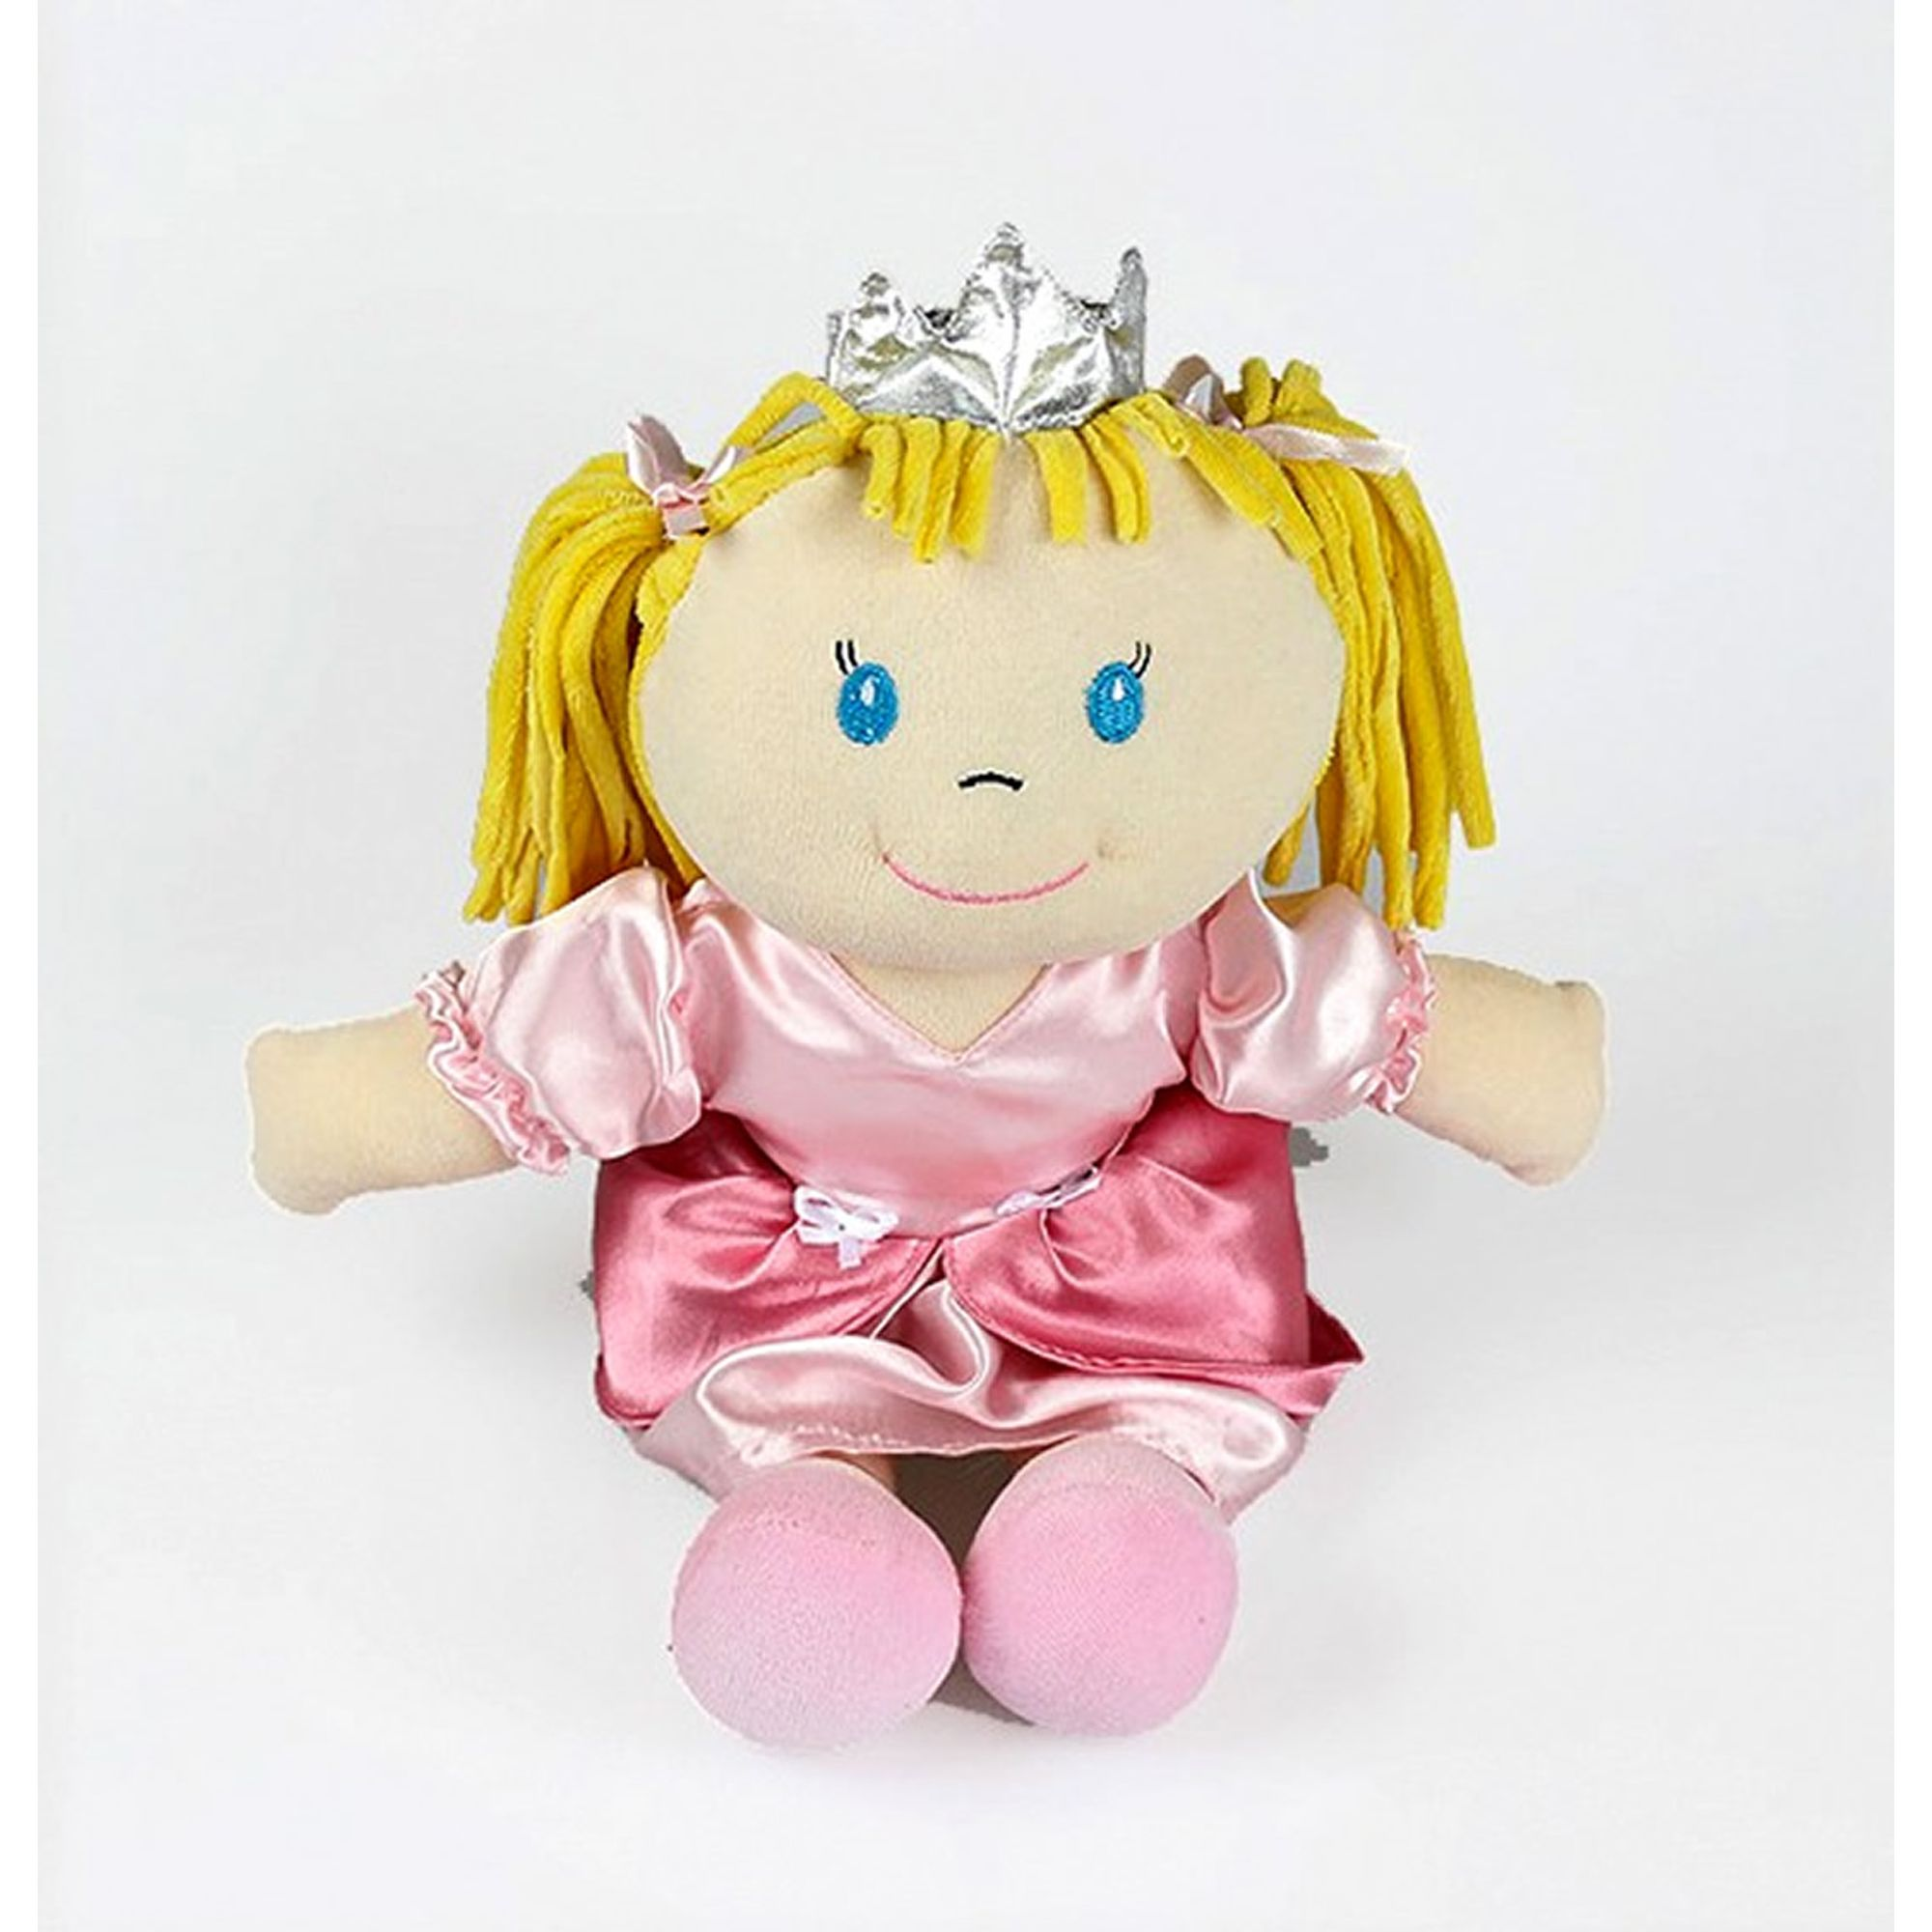 boneca-princesa-laura-plush-e-cetim-zip-toys